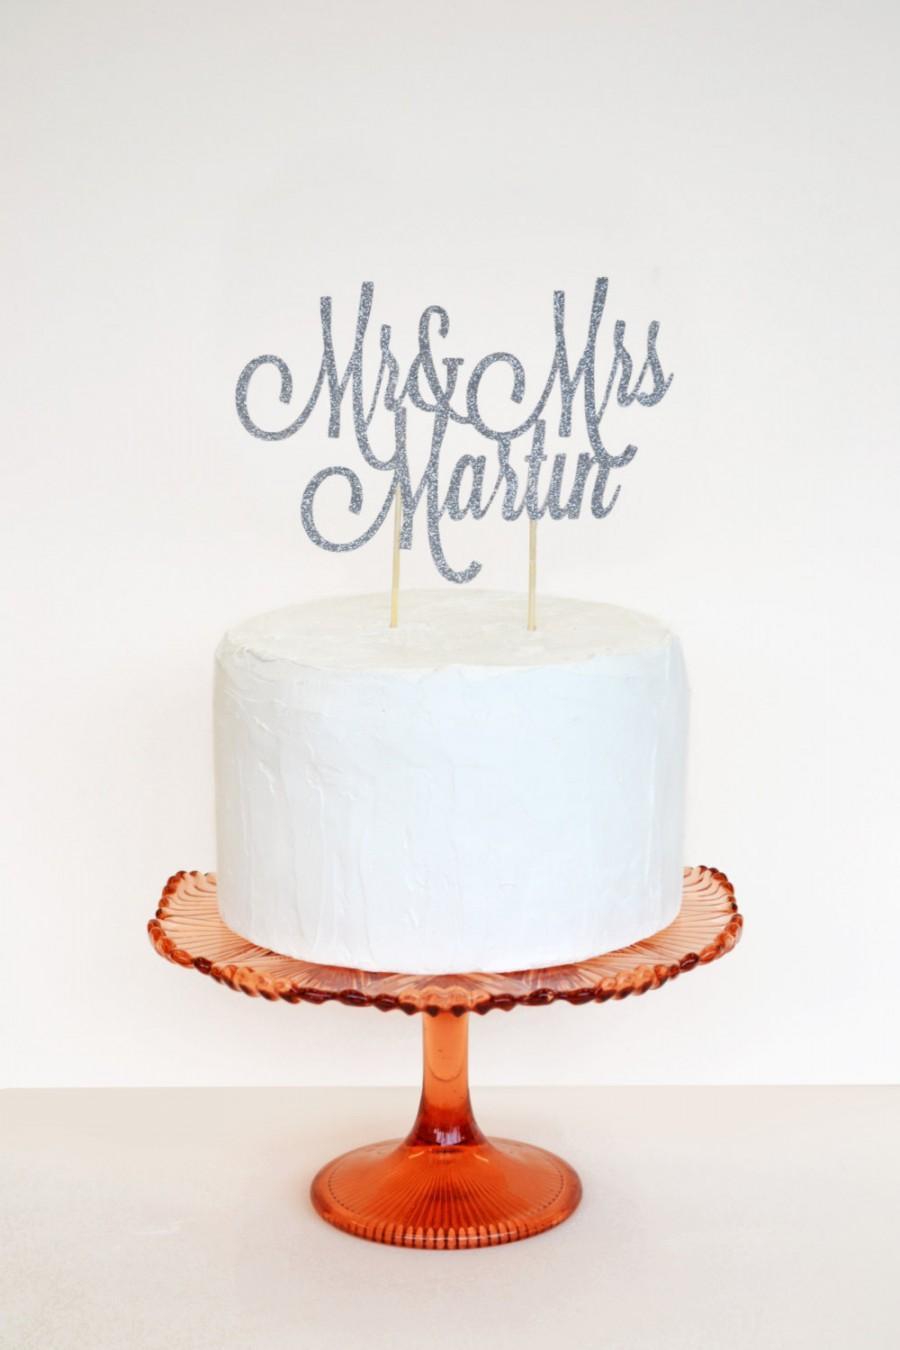 Hochzeit - Glitter custom name cake topper or wedding decoration